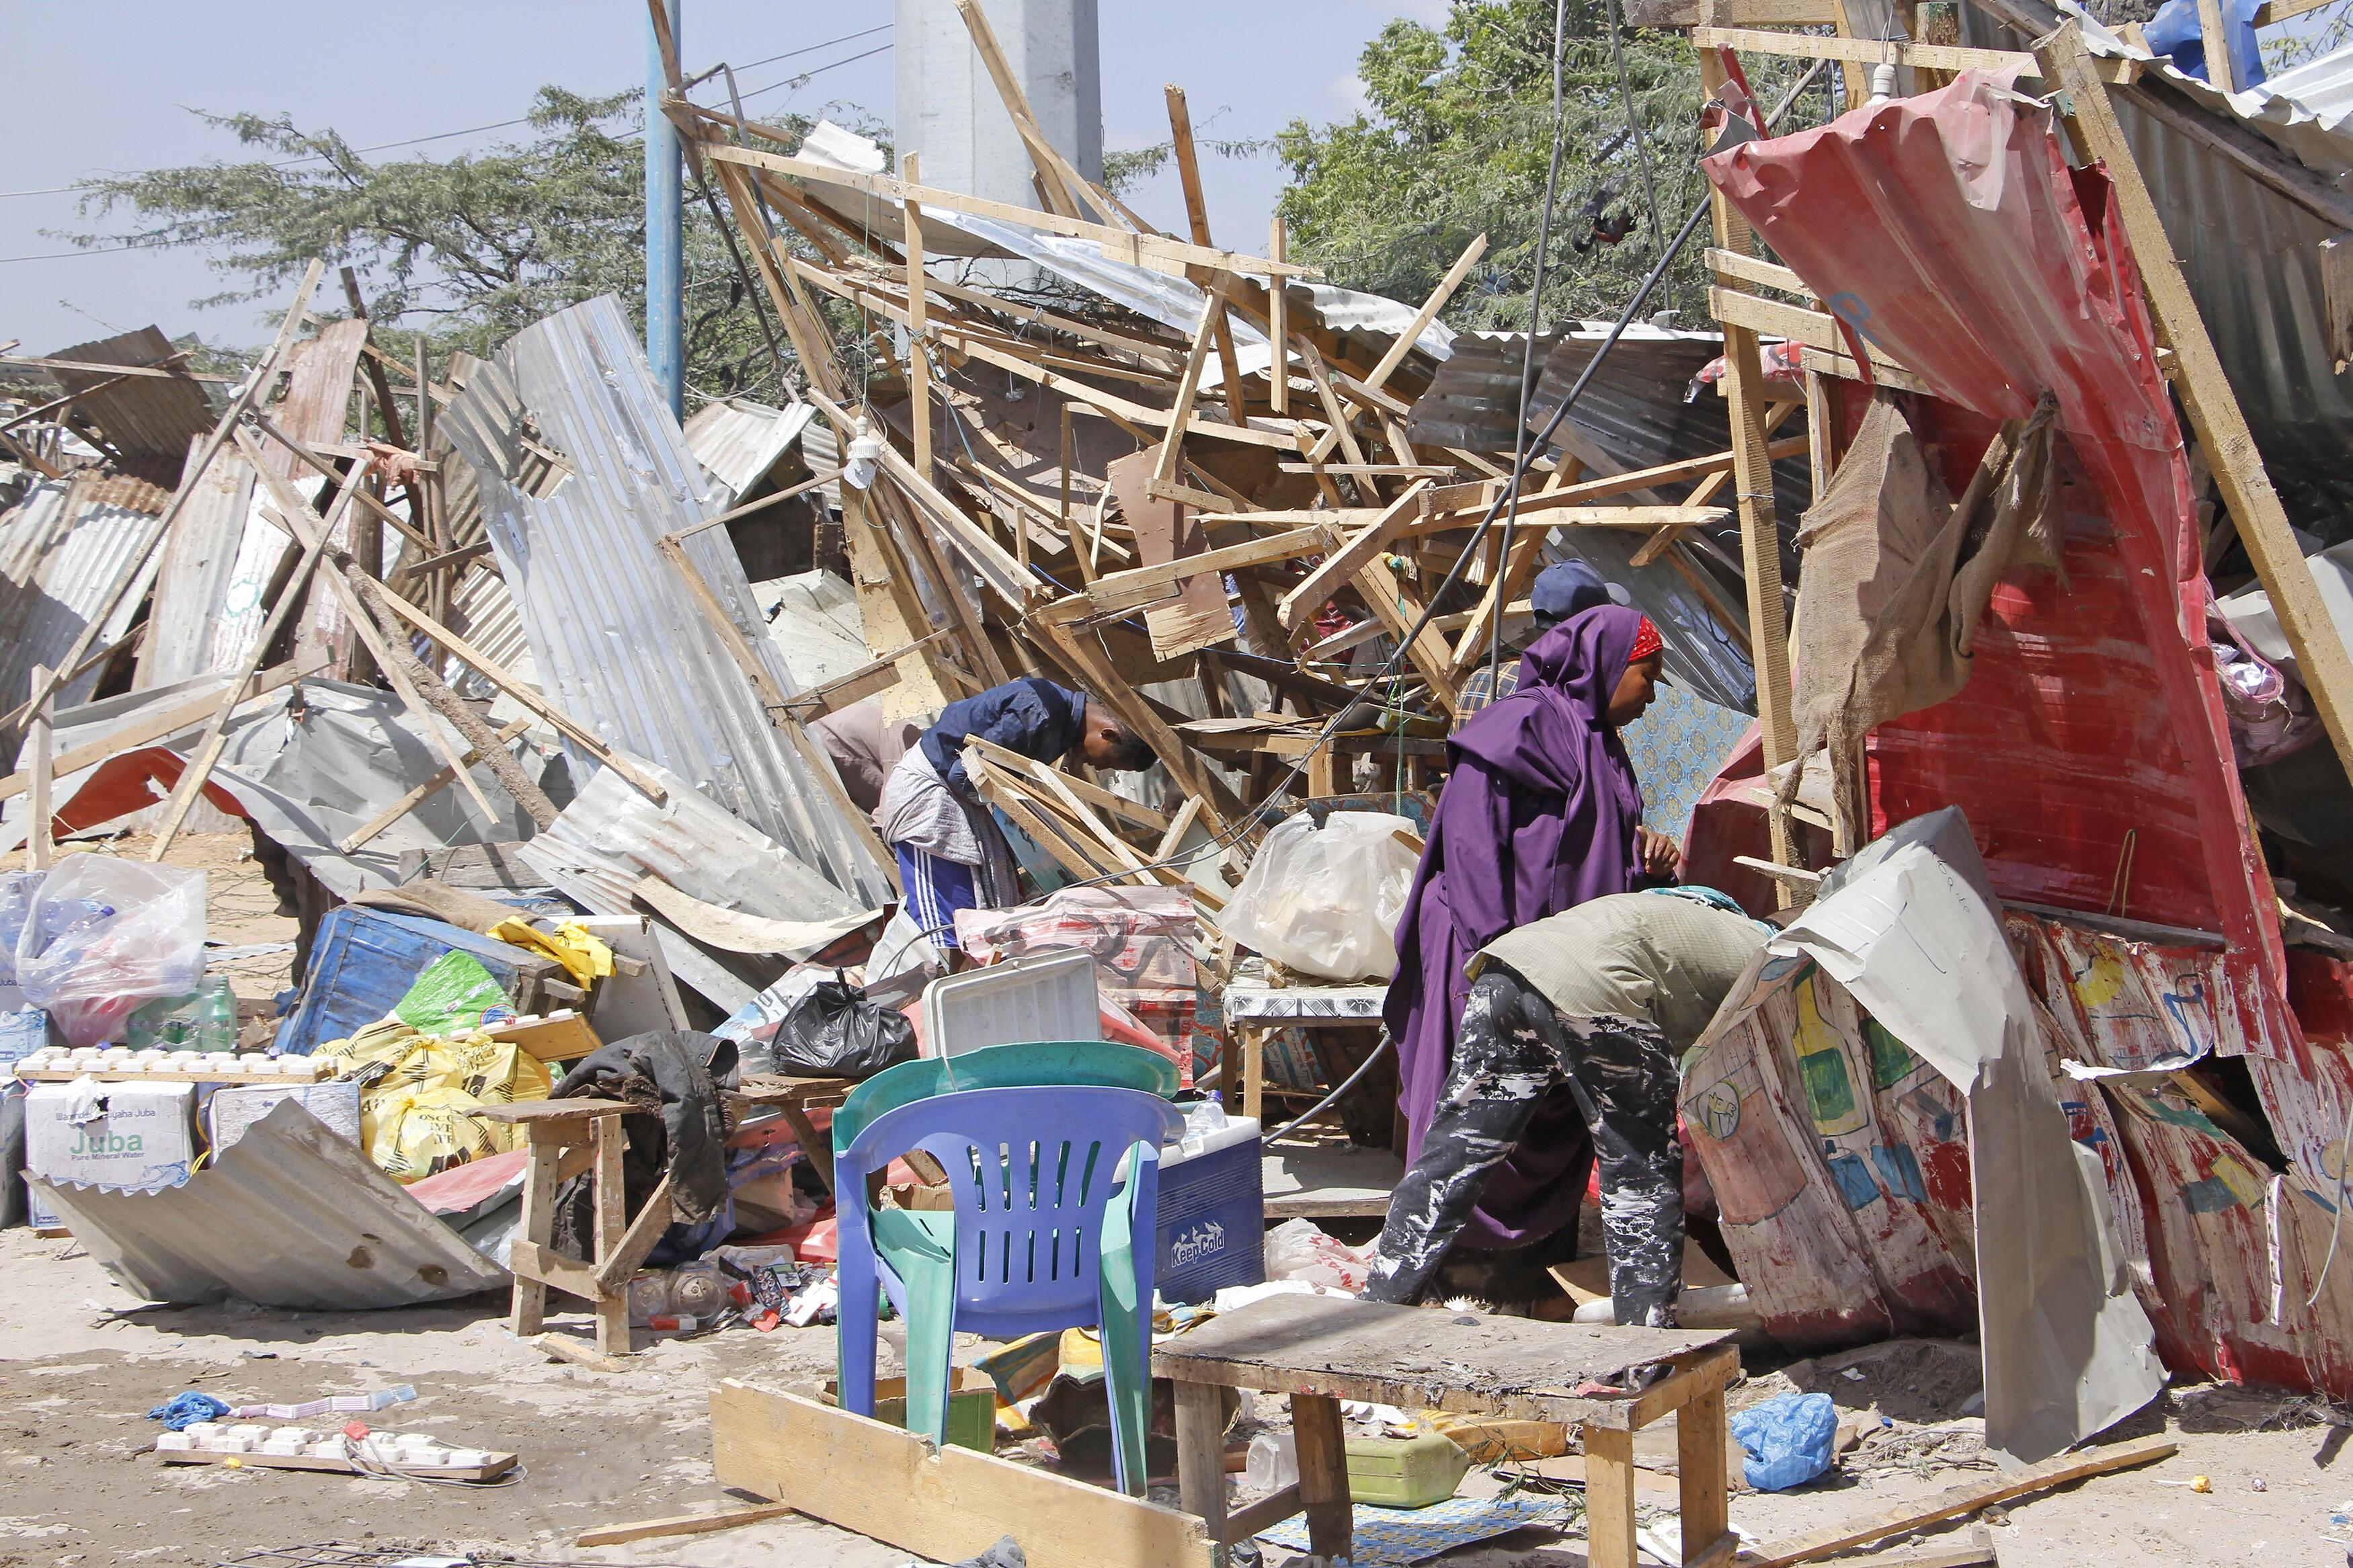 Destruction from bomb blast